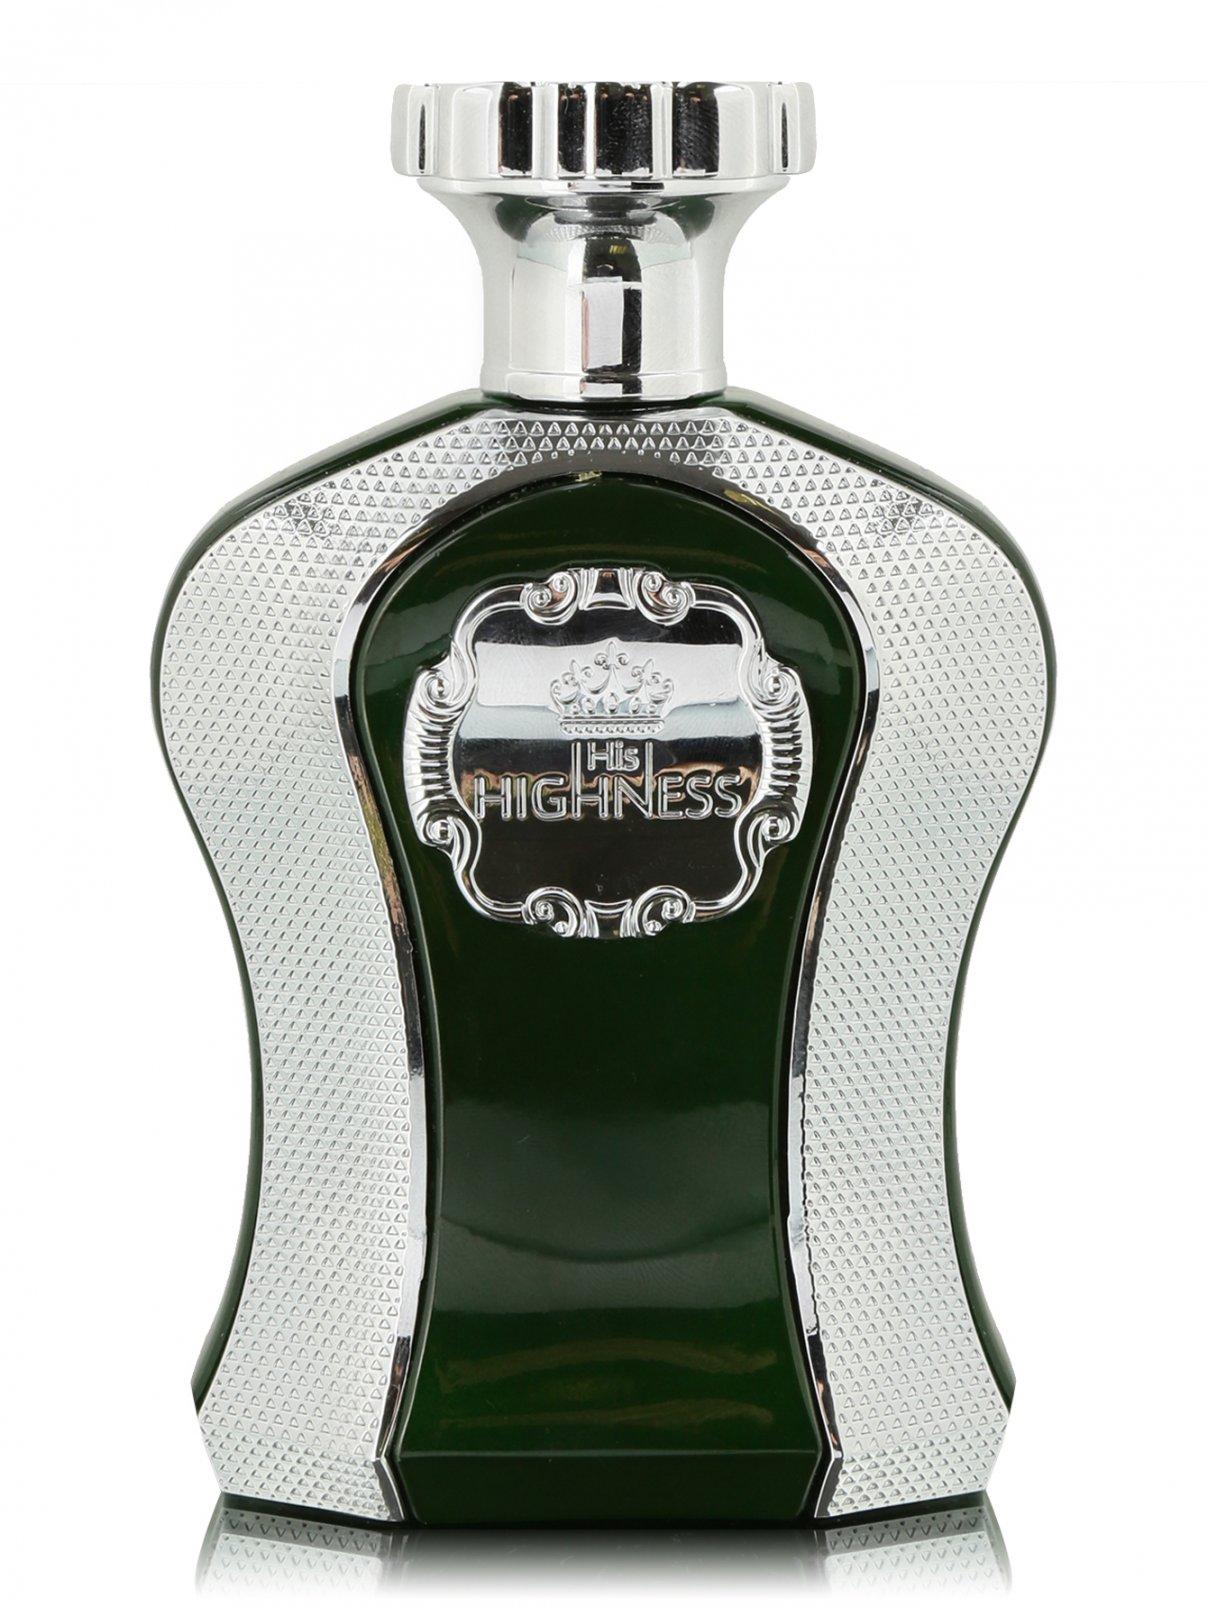 Парфюмерная вода 100 мл HIS HIGHNESS GREEN Afnan Afnan Perfumes  –  Общий вид